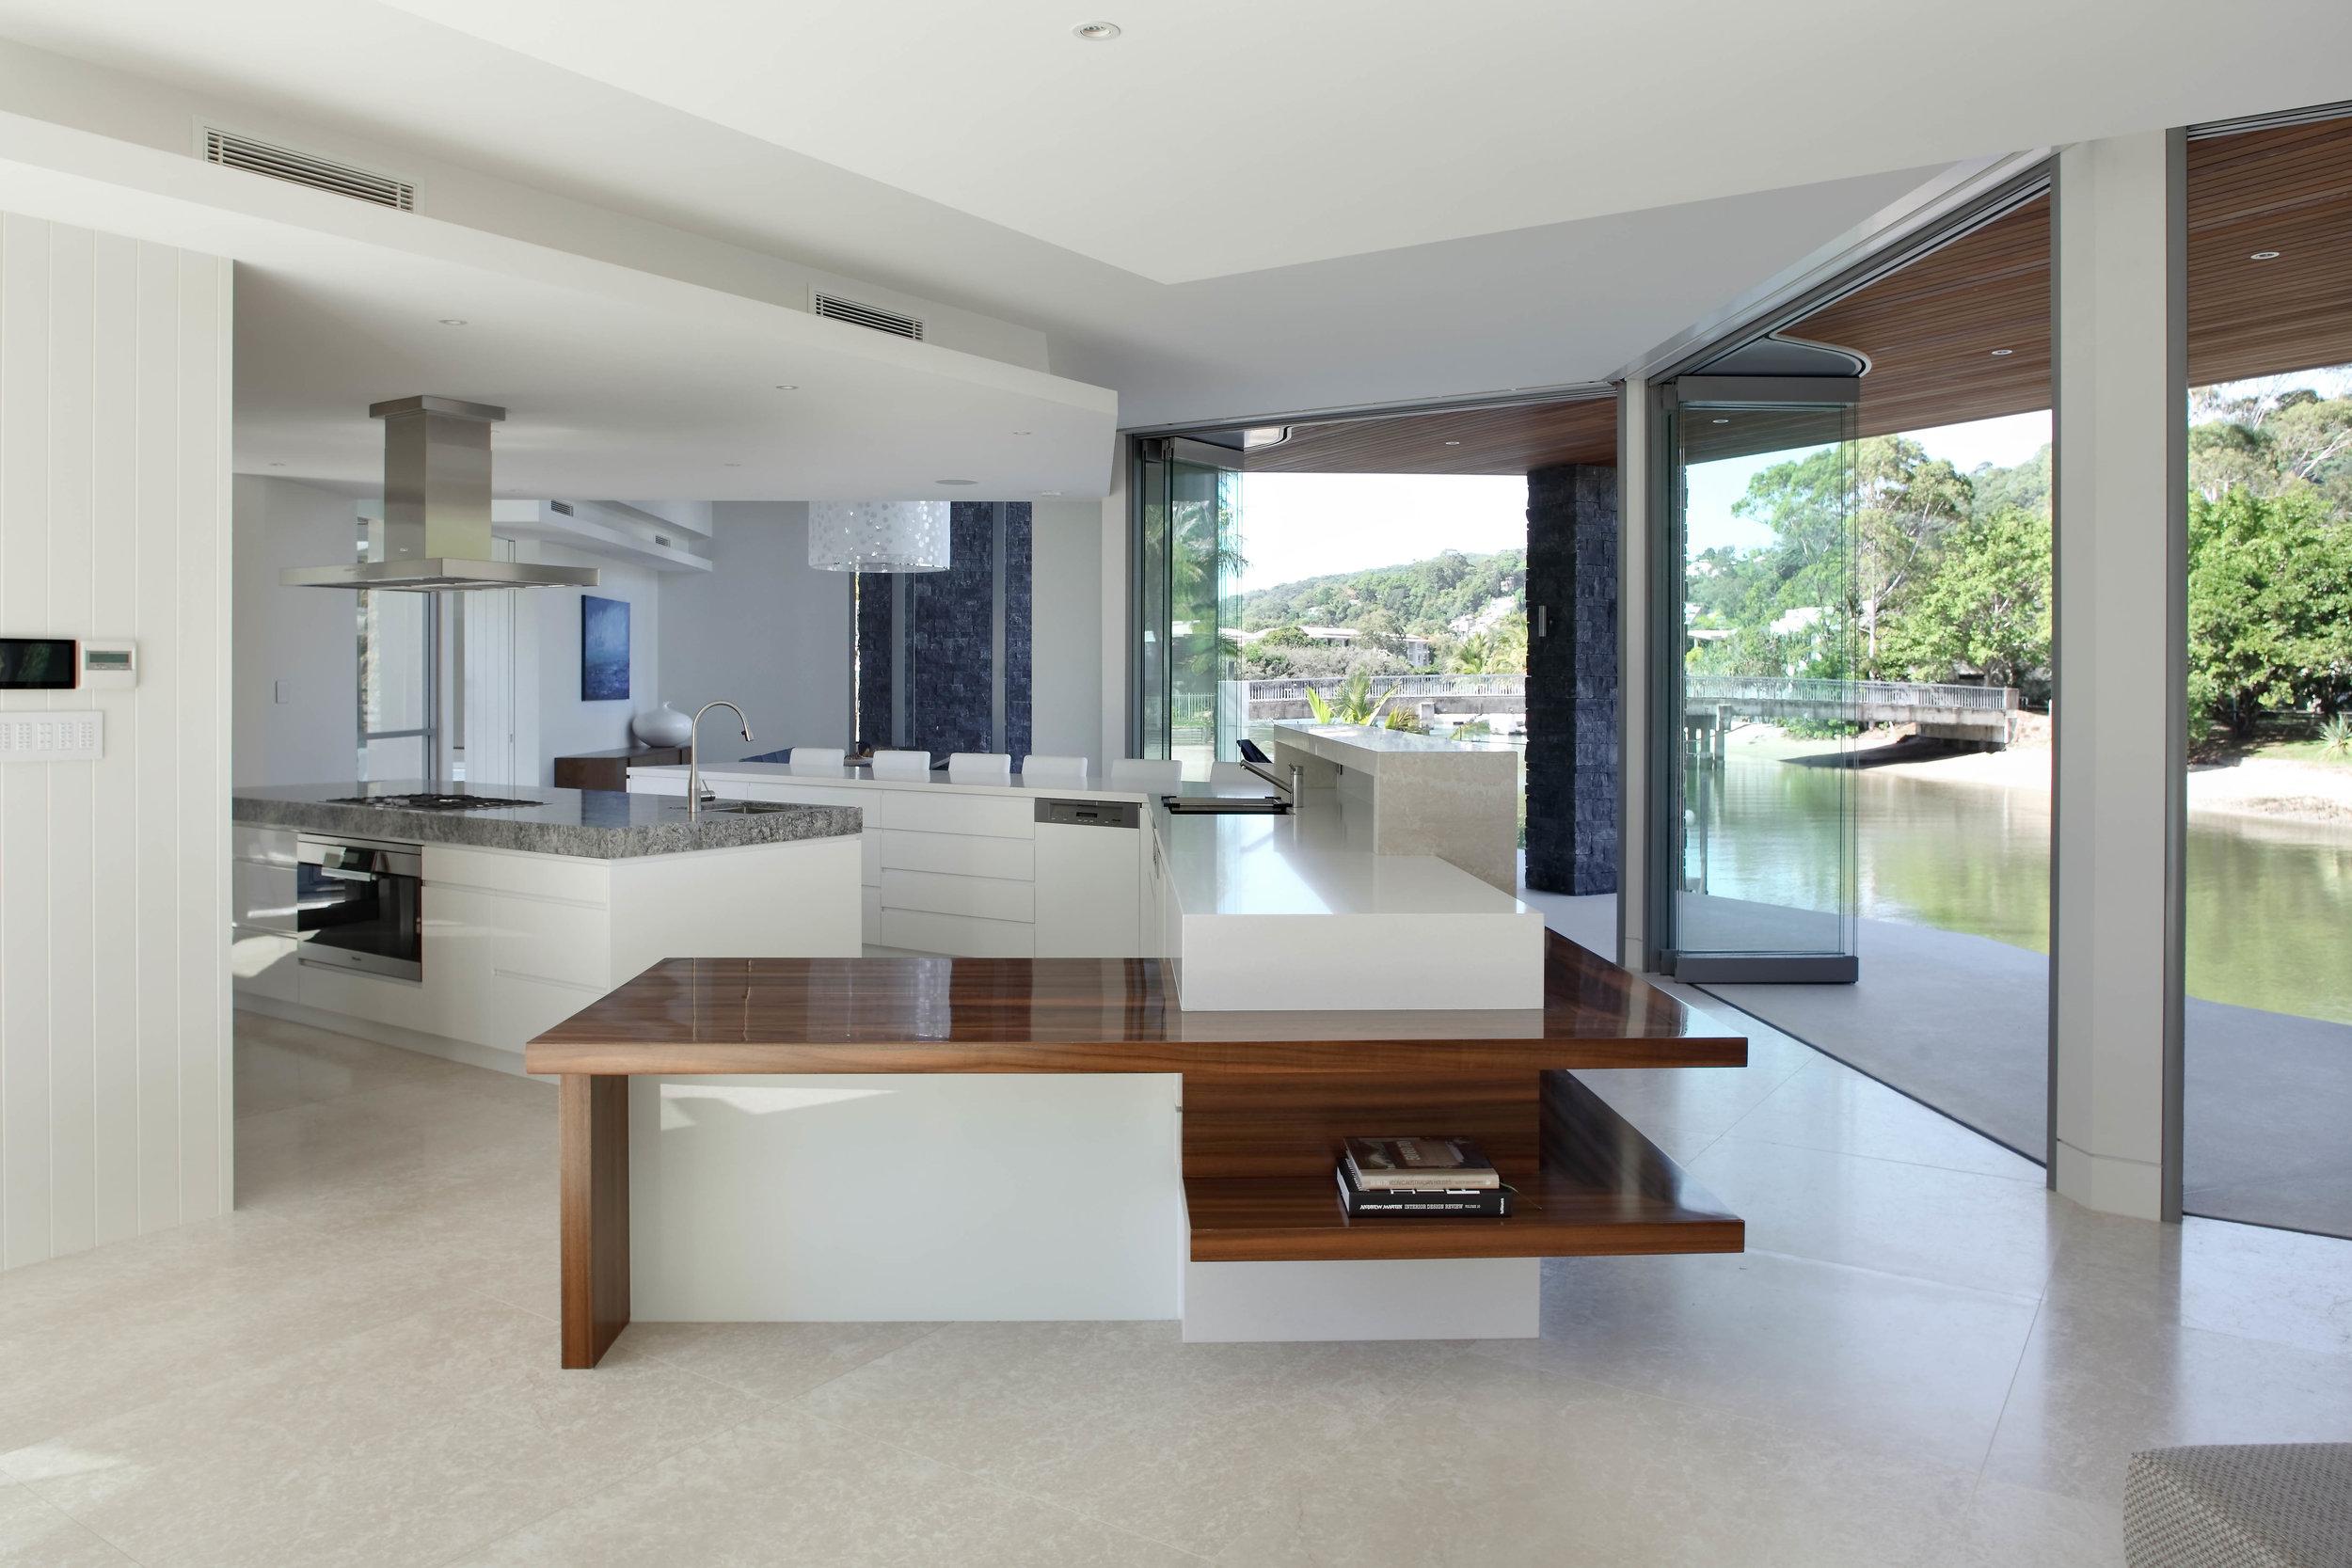 13 Wesley 5 kitchen 0 (1).jpg